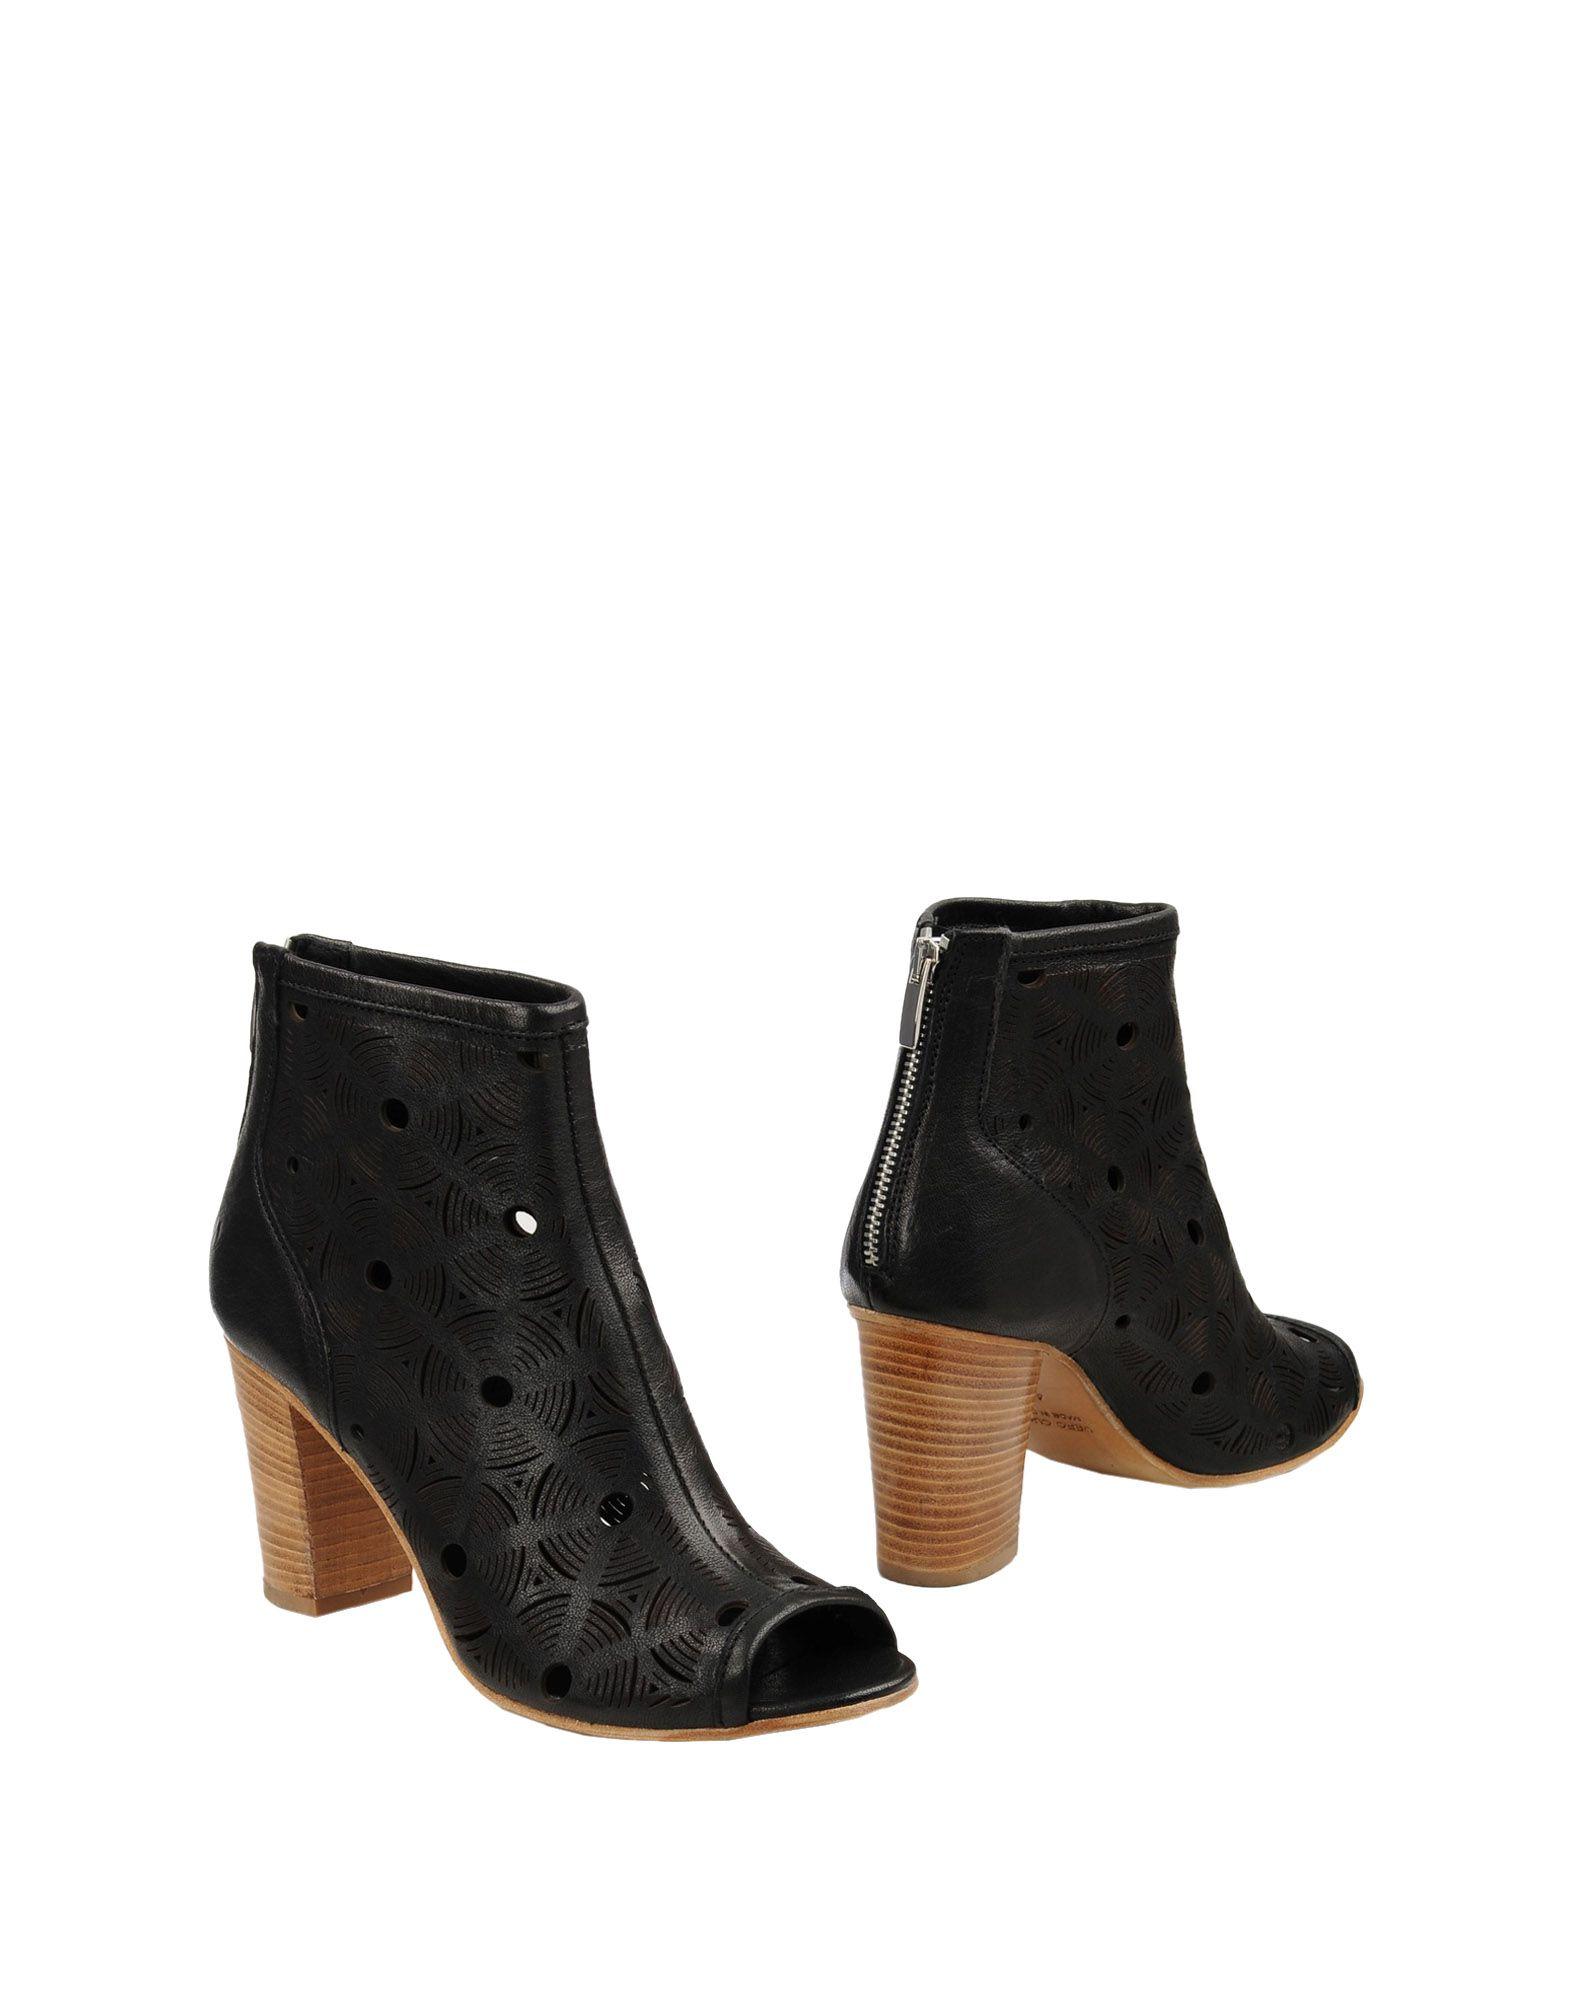 Leonardo Principi Stiefelette Damen  11426396SV Gute Qualität beliebte Schuhe